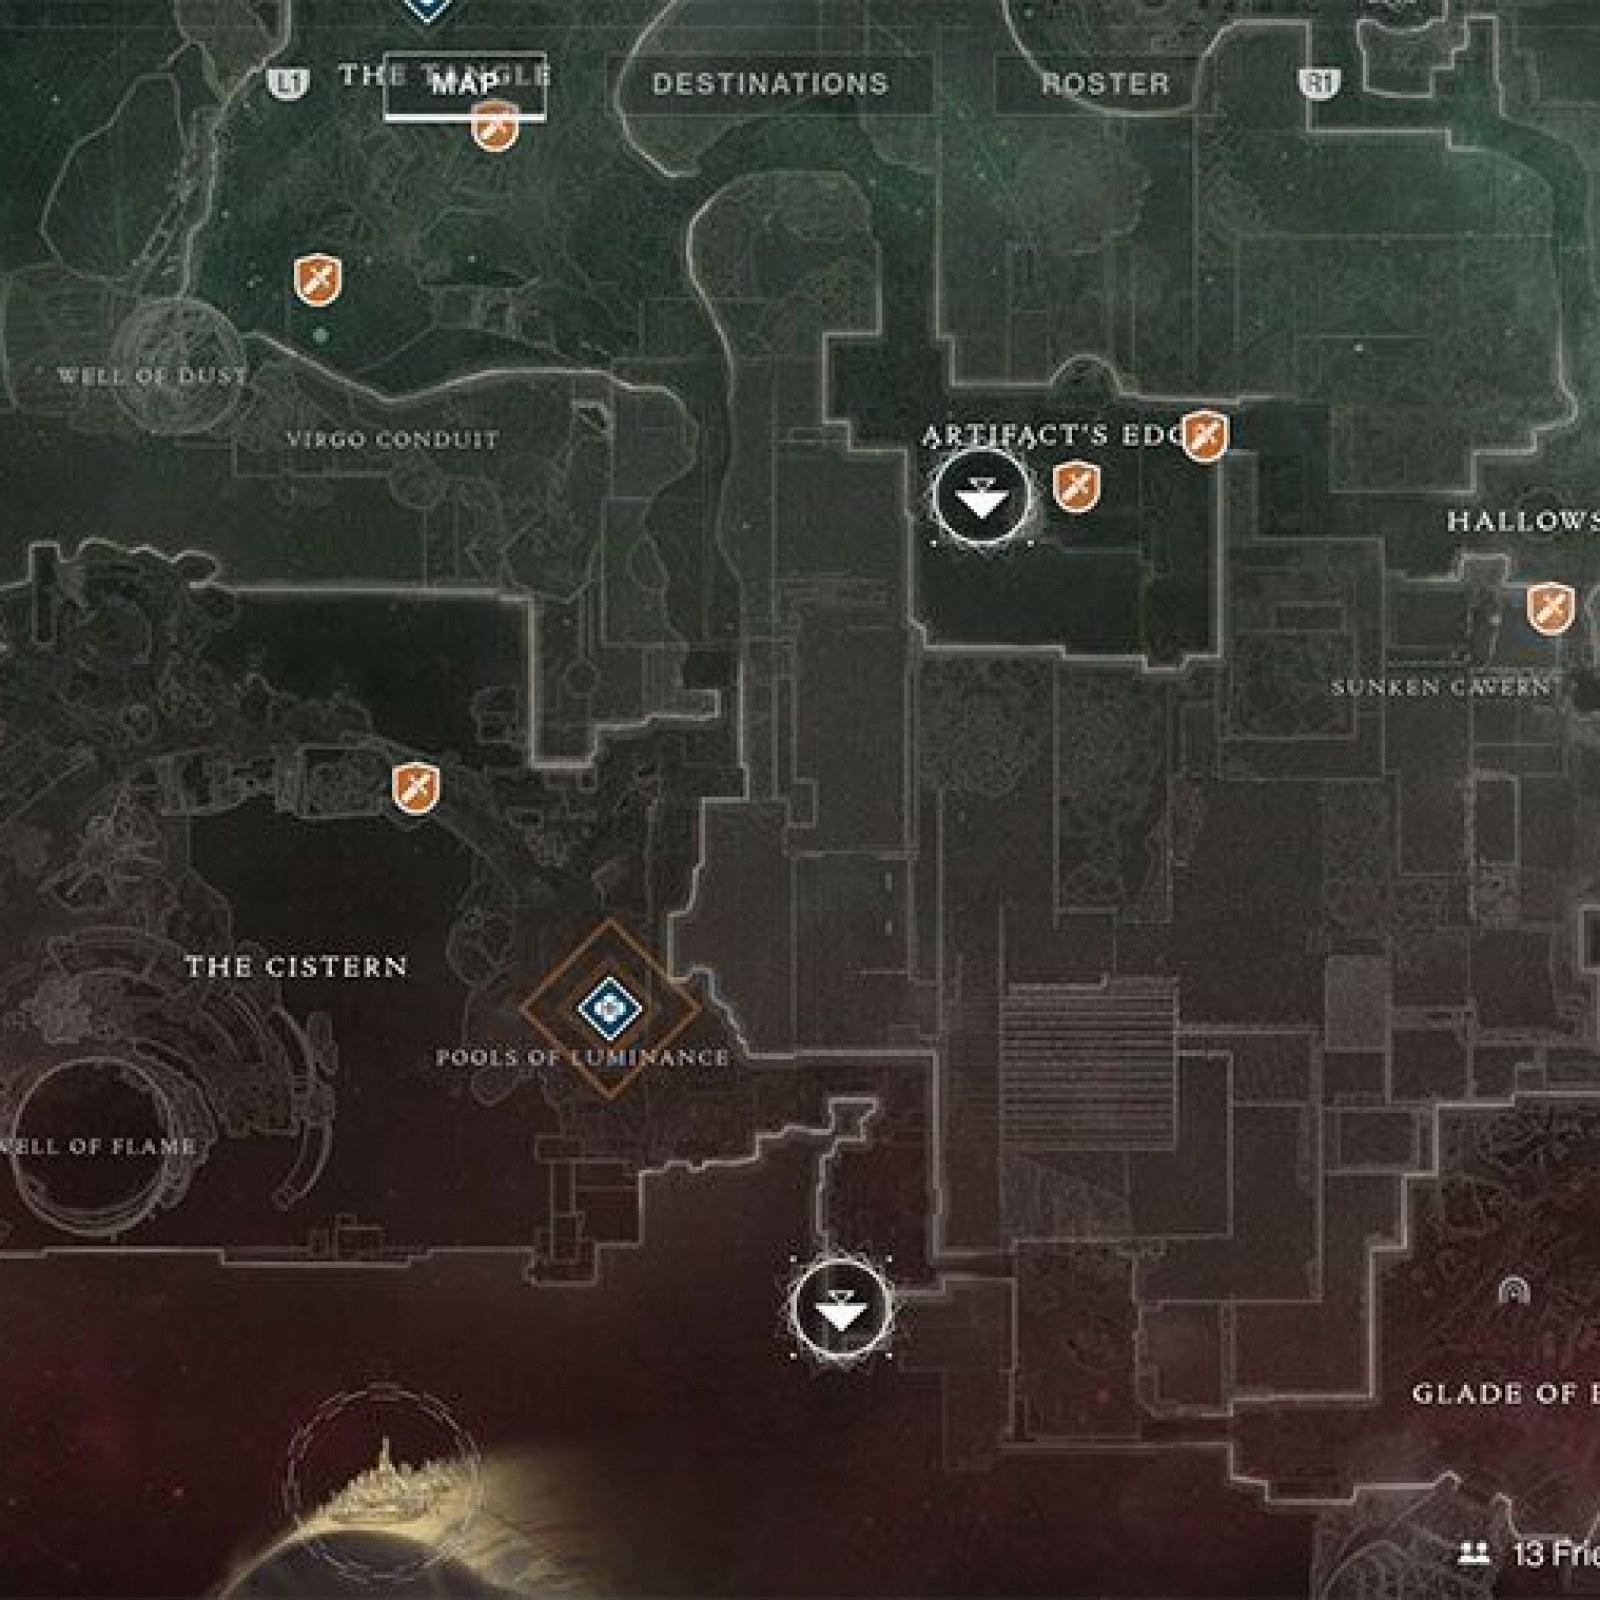 Destiny 2' All Spider Bounty Locations - Drain, Excavation